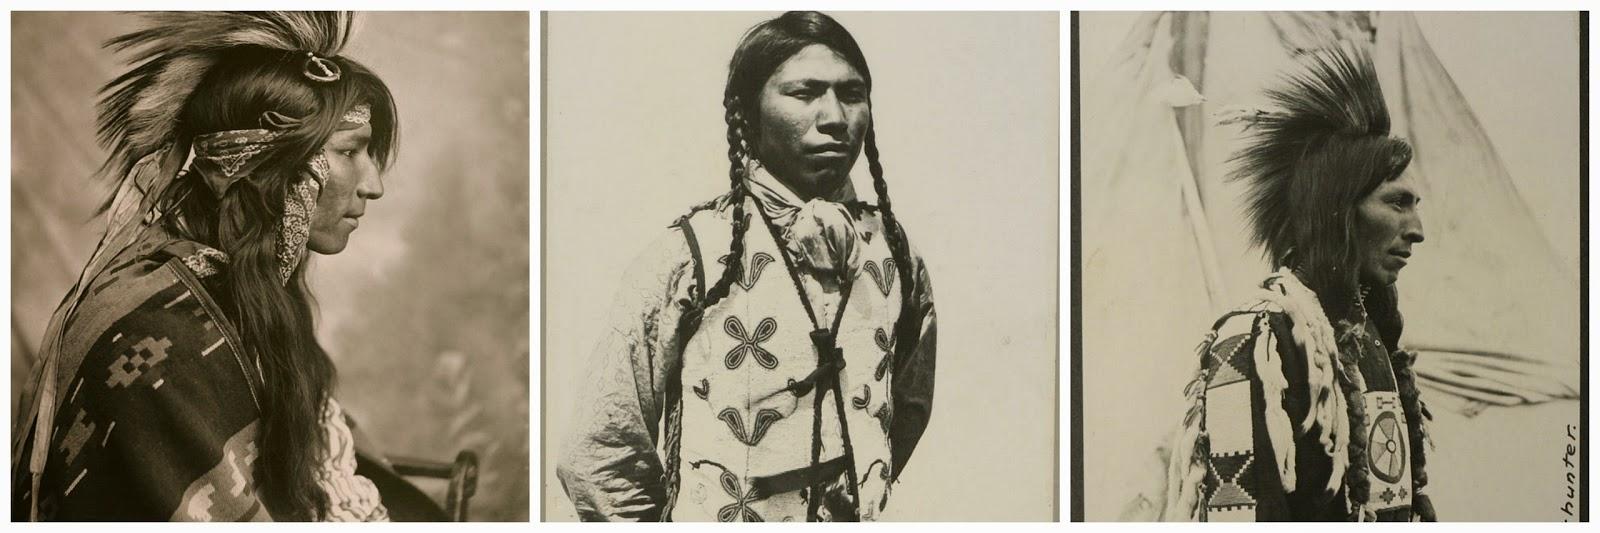 Cree native american indian beliefs